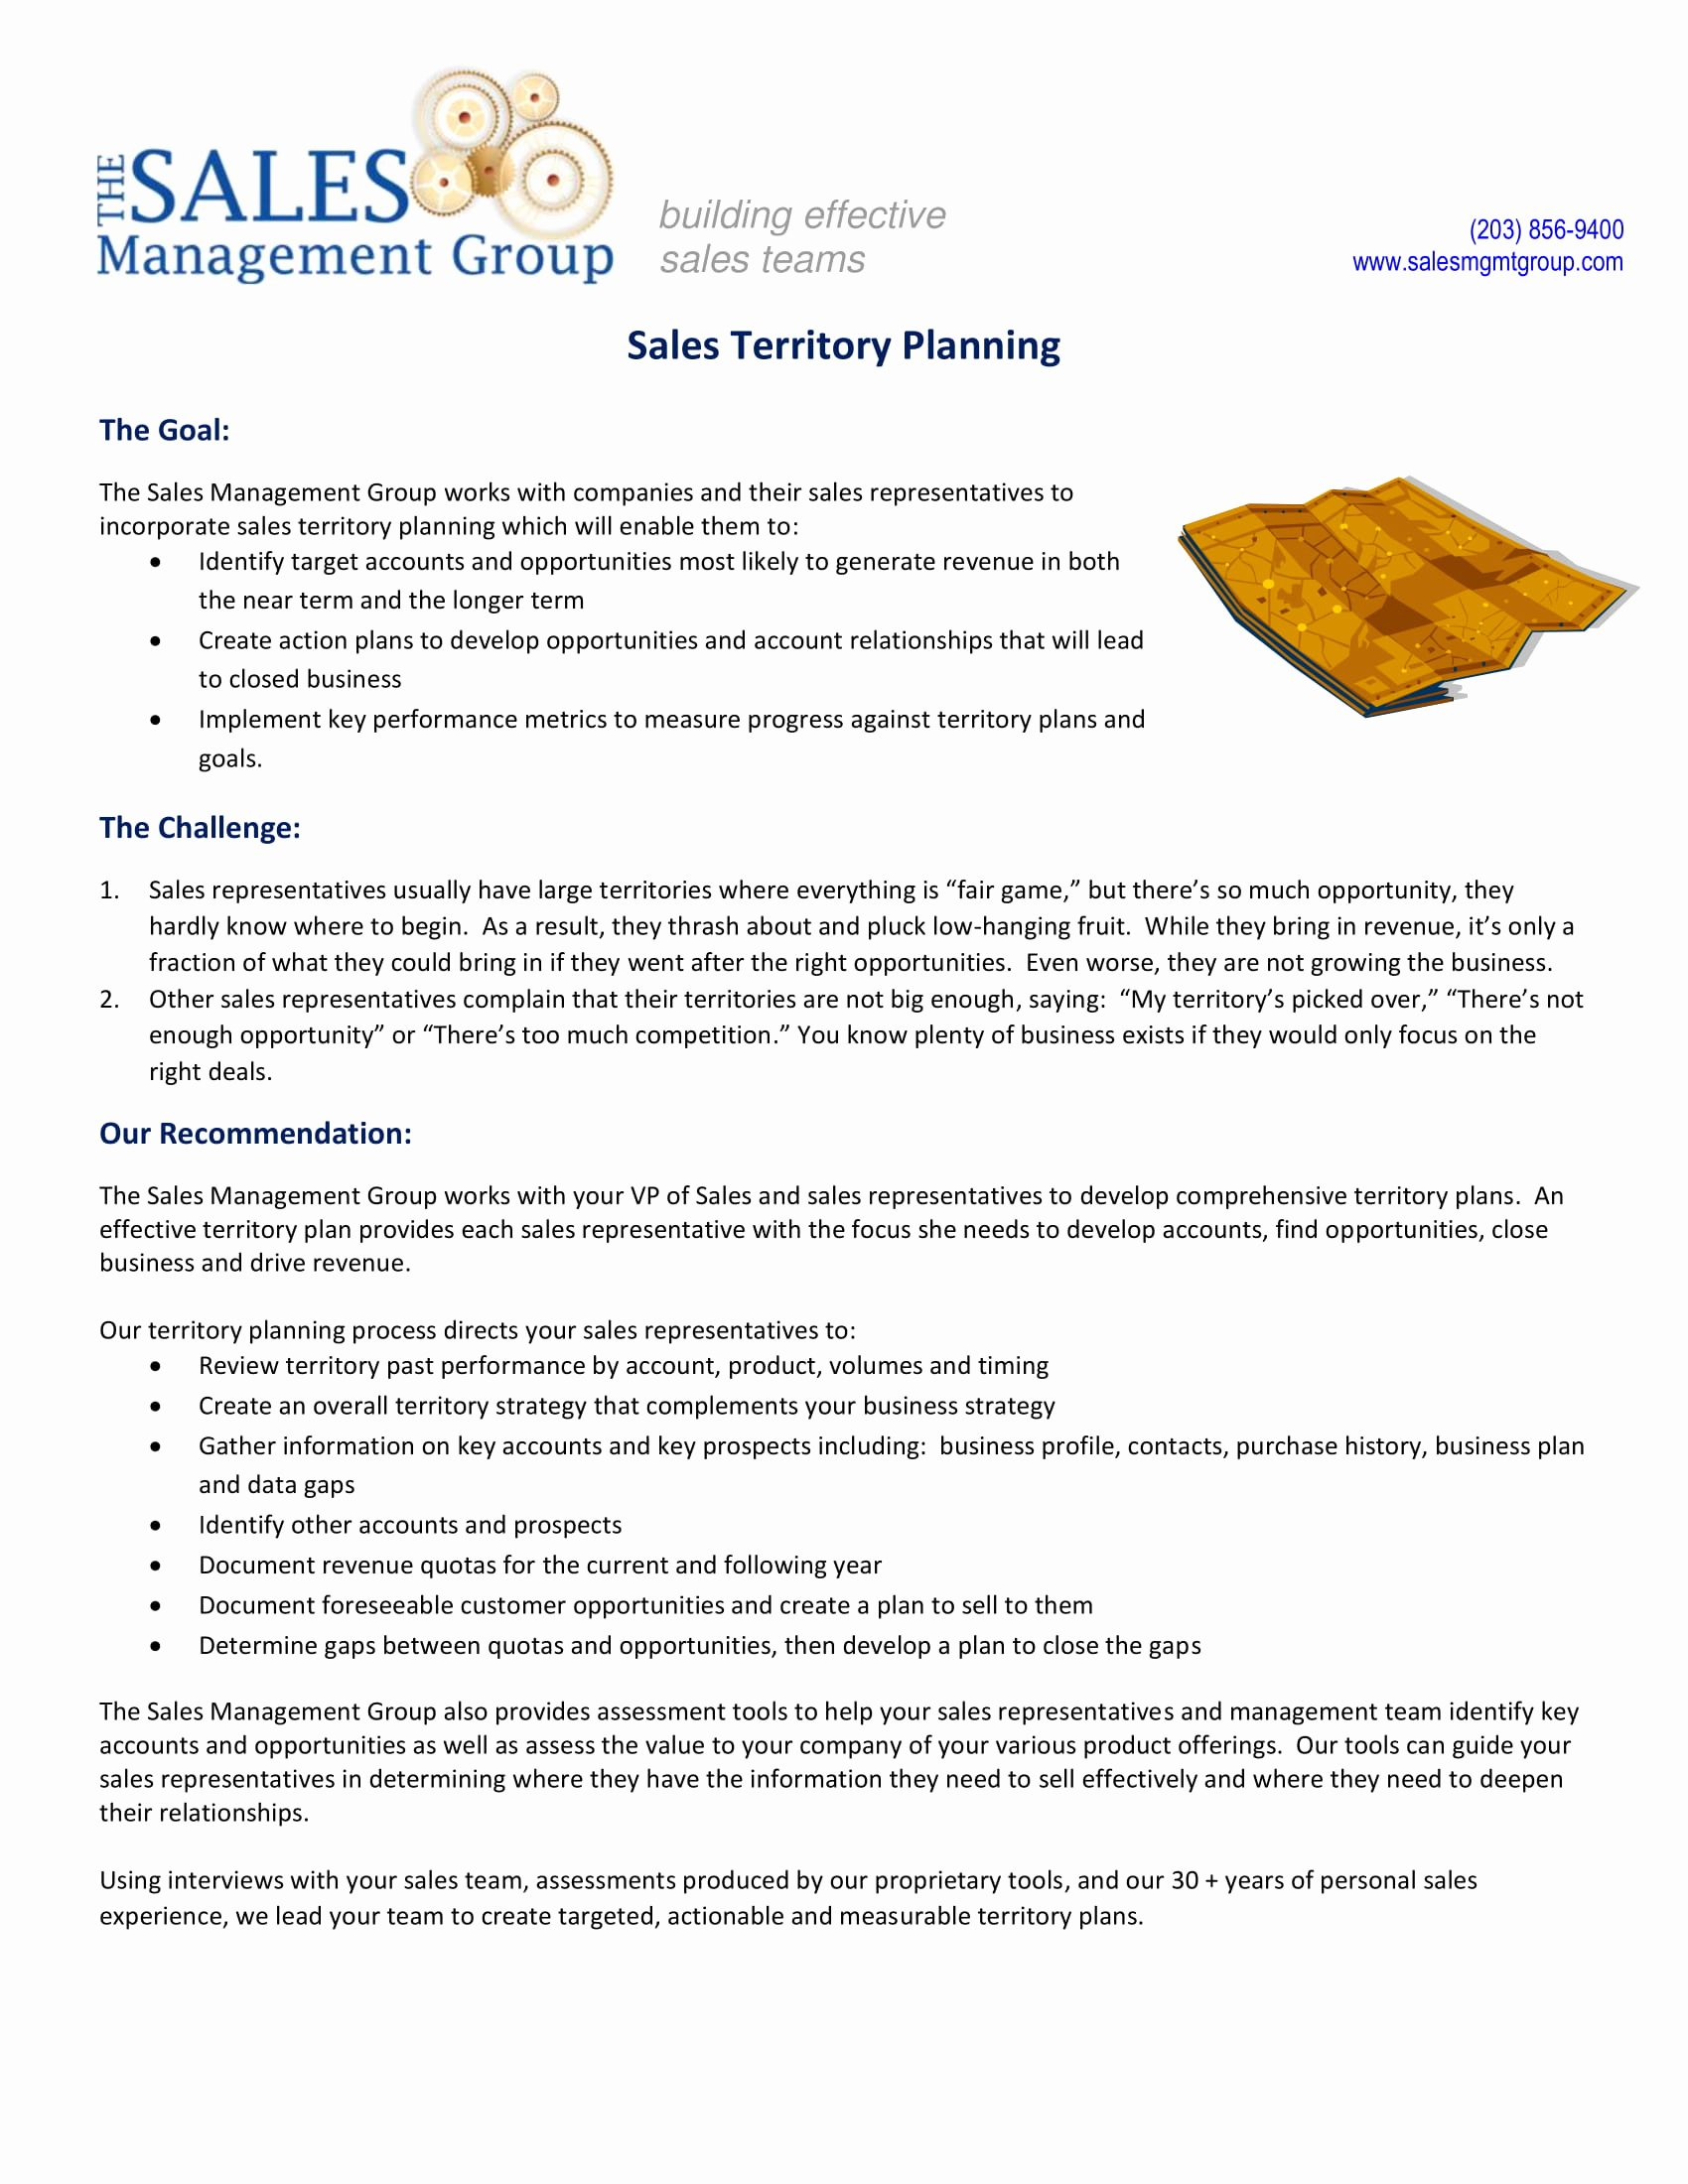 Territory Management Plan Template Elegant 10 Territory Sales Plan Examples Pdf Word